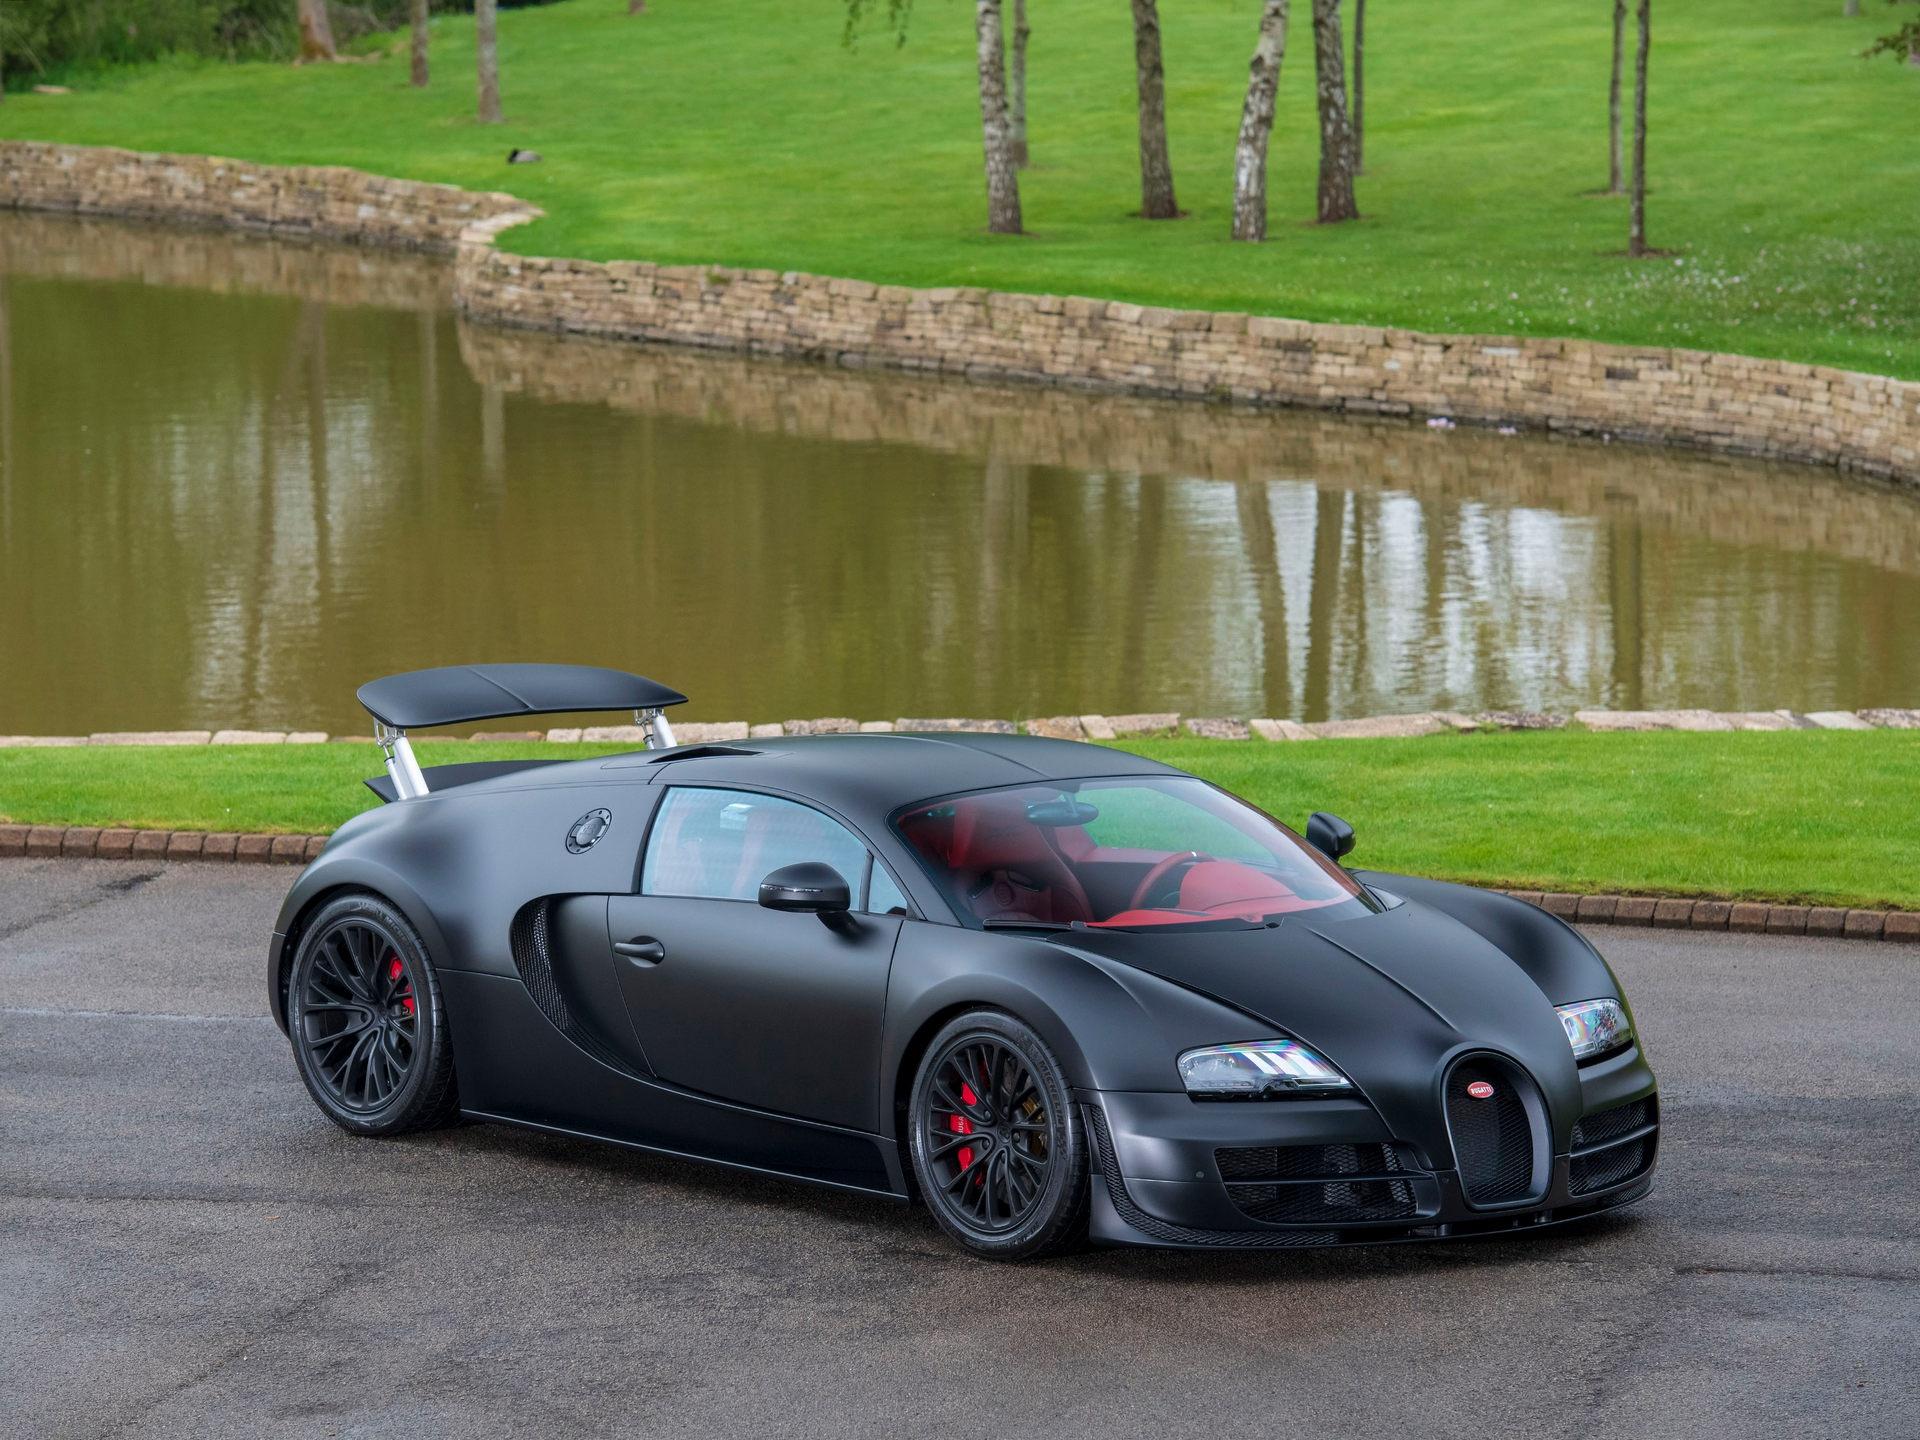 Bugatti Veyron Super Sport cuoi cung duoc rao ban anh 1